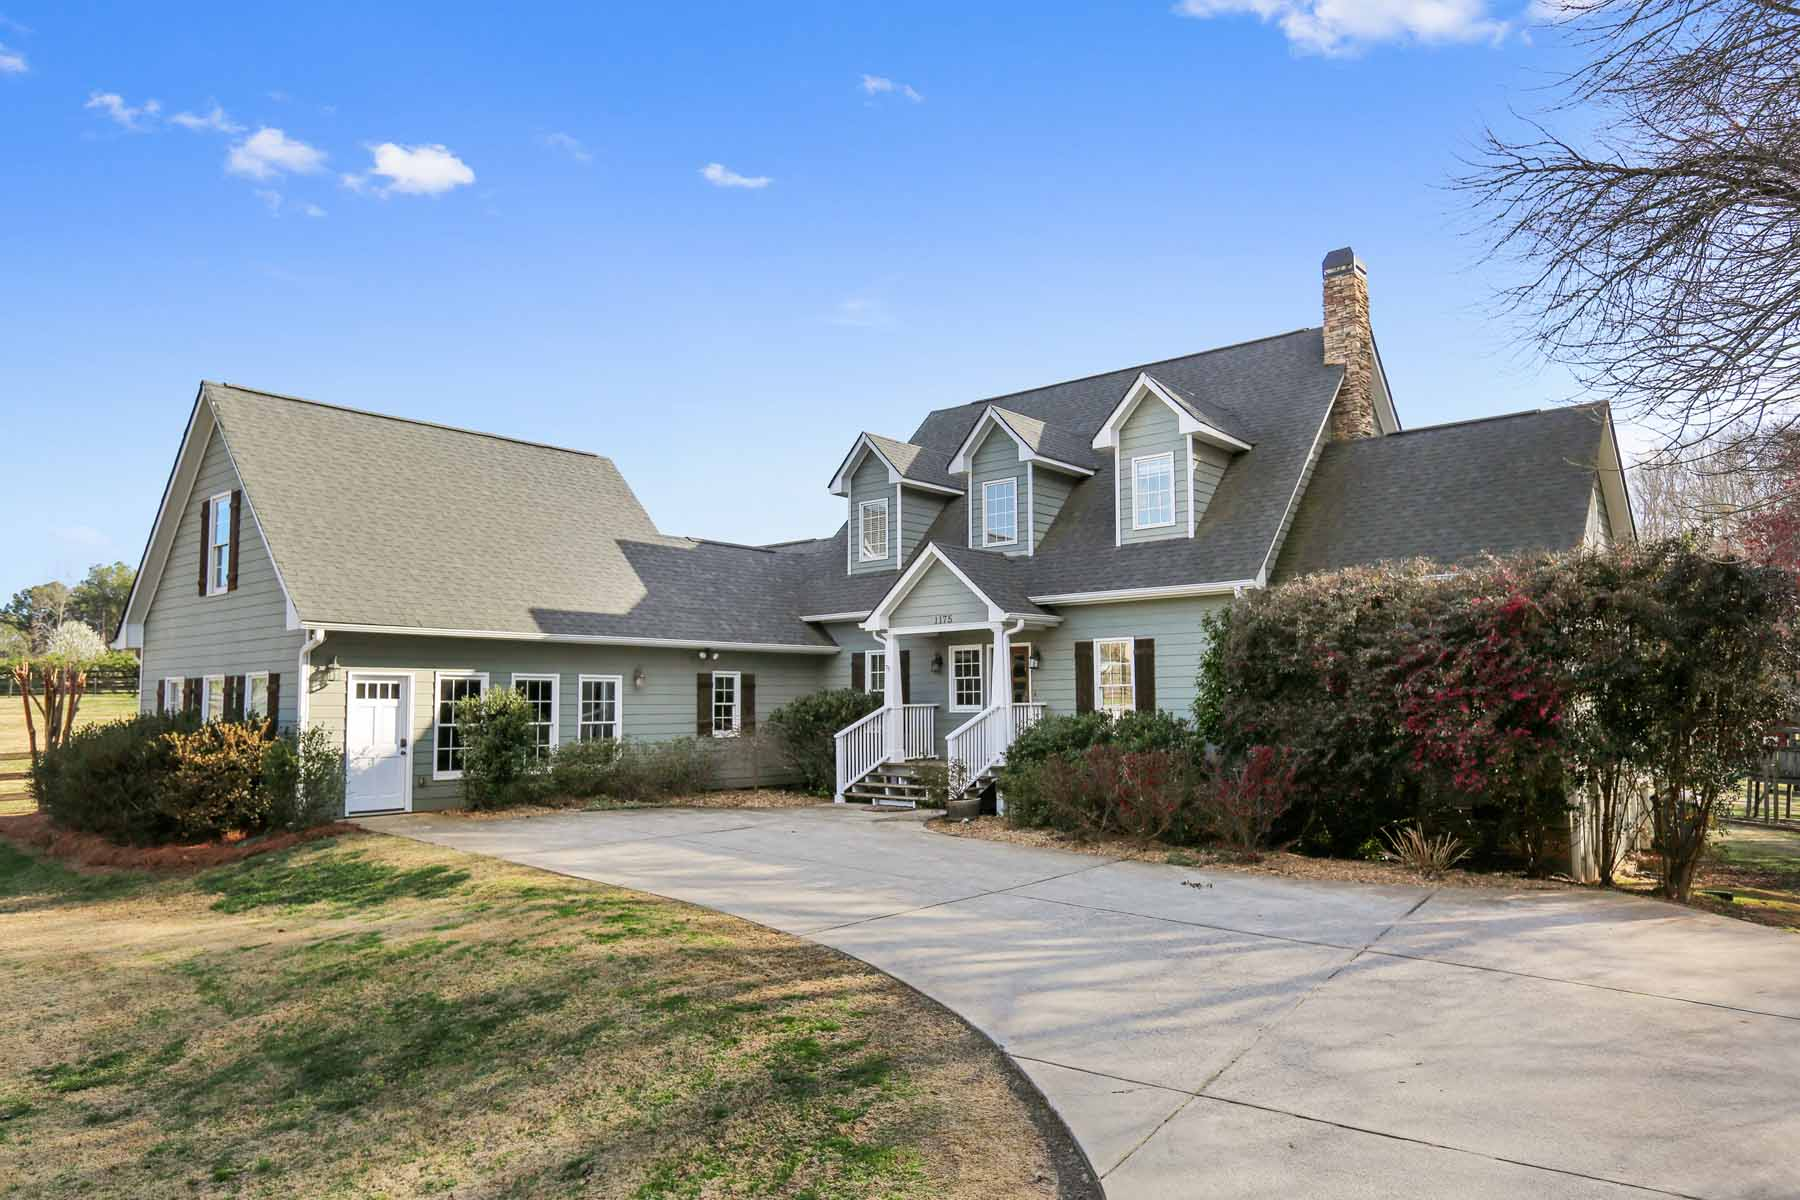 Single Family Home for Sale at Peaceful Equestrian 7 Acre Estate –Close to Both Historic Alpharetta & Crabapple 1175 Mid Broadwell Road Alpharetta, Georgia, 30004 United States